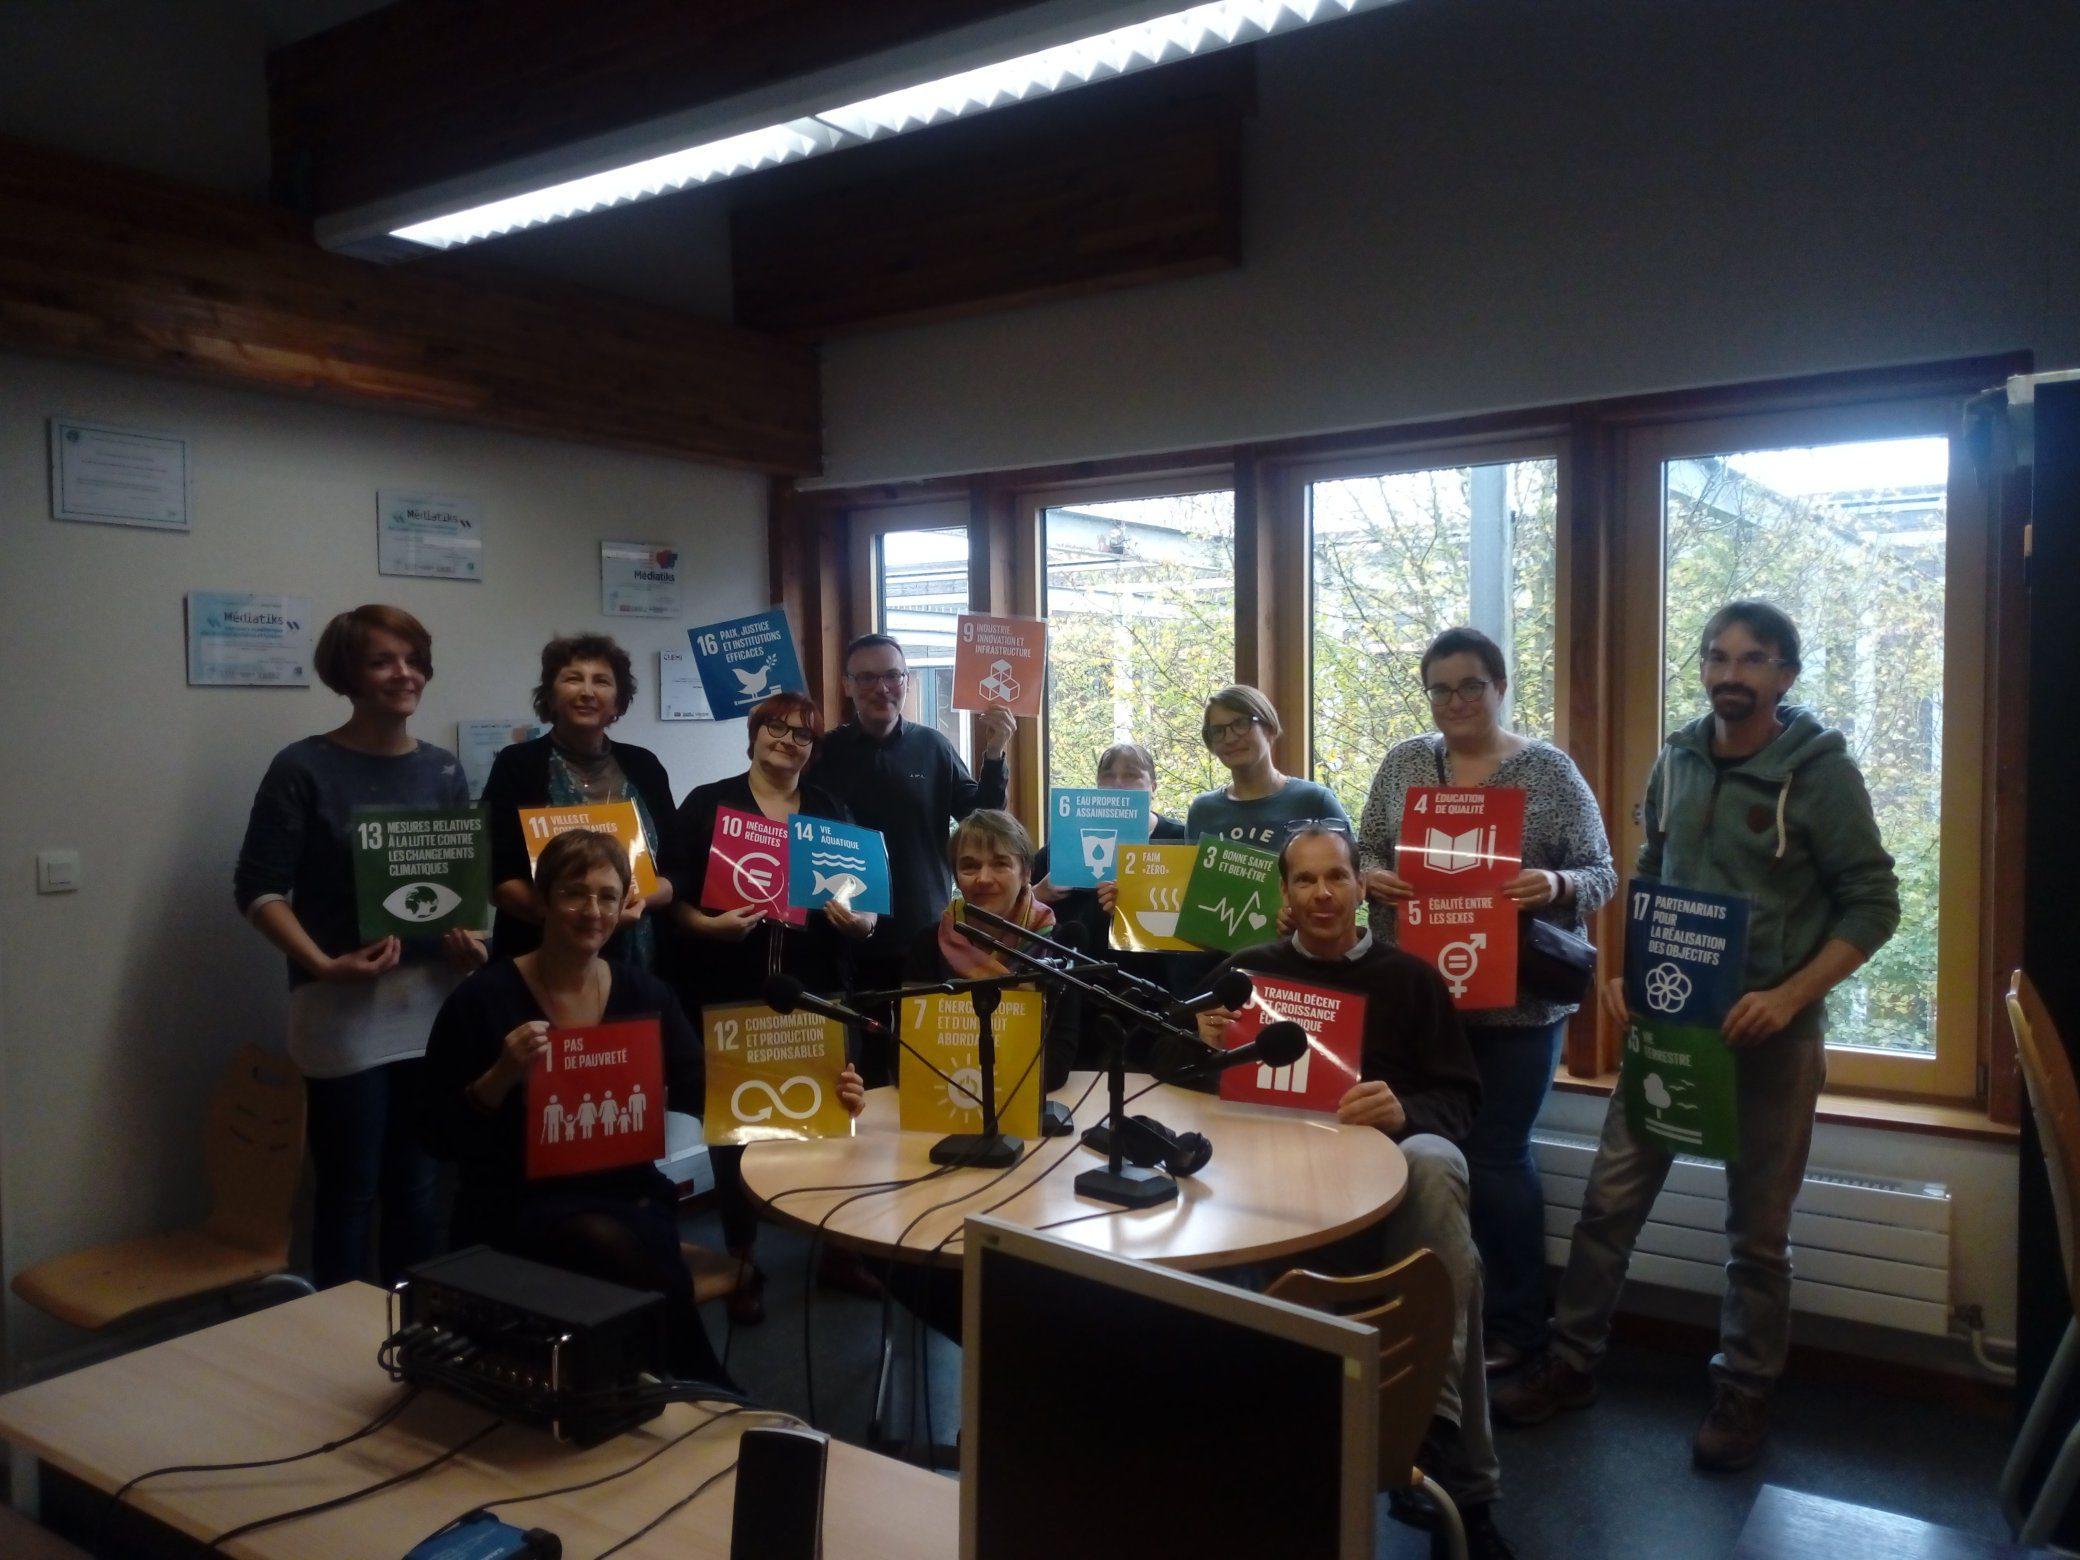 L'équipe Erasmus + issus de Lorraine, Pays Basque, Belgique et Allemagne